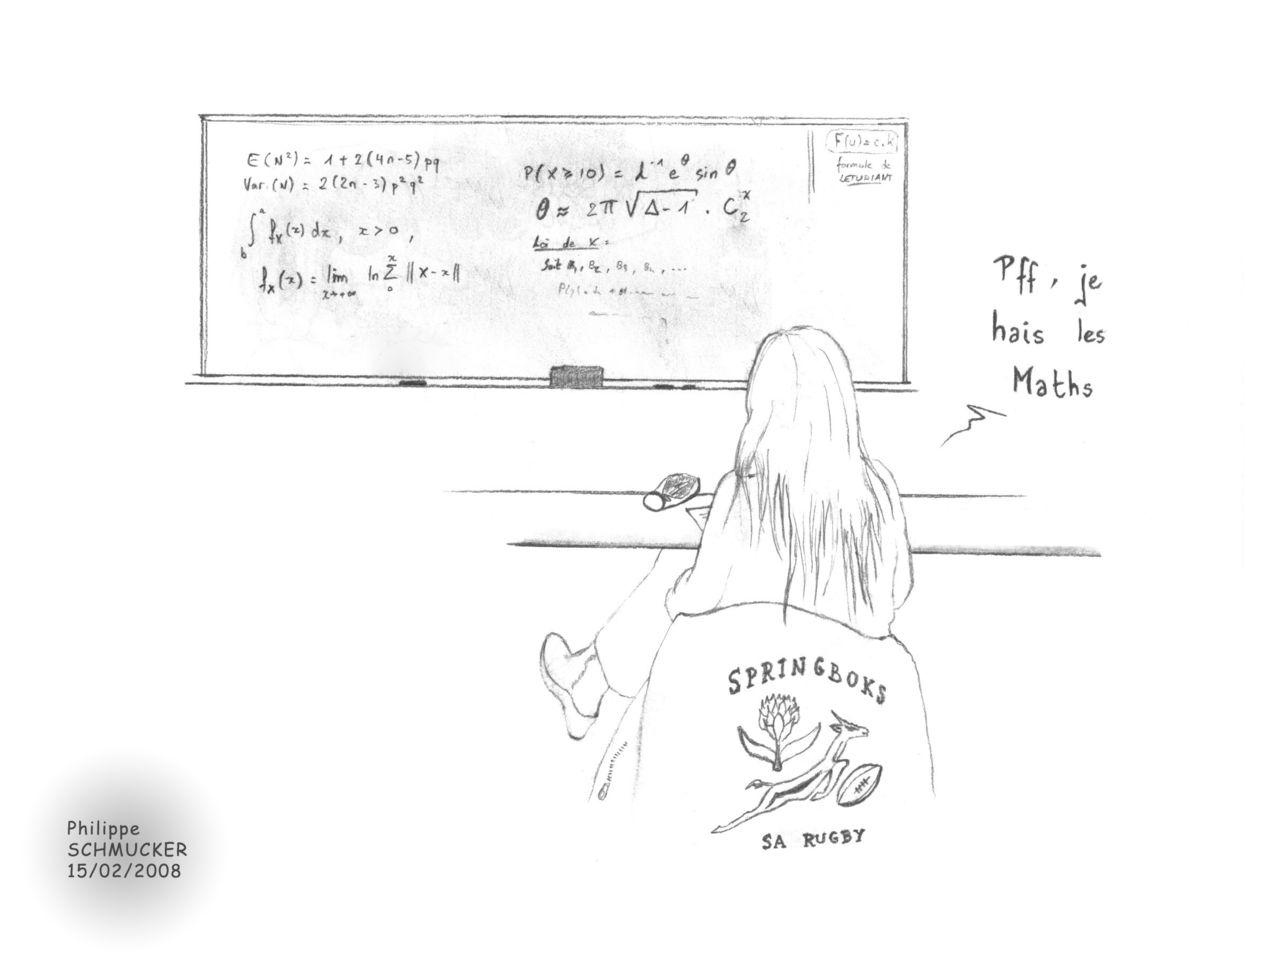 Philippe Schmucker Cynthia et les Maths